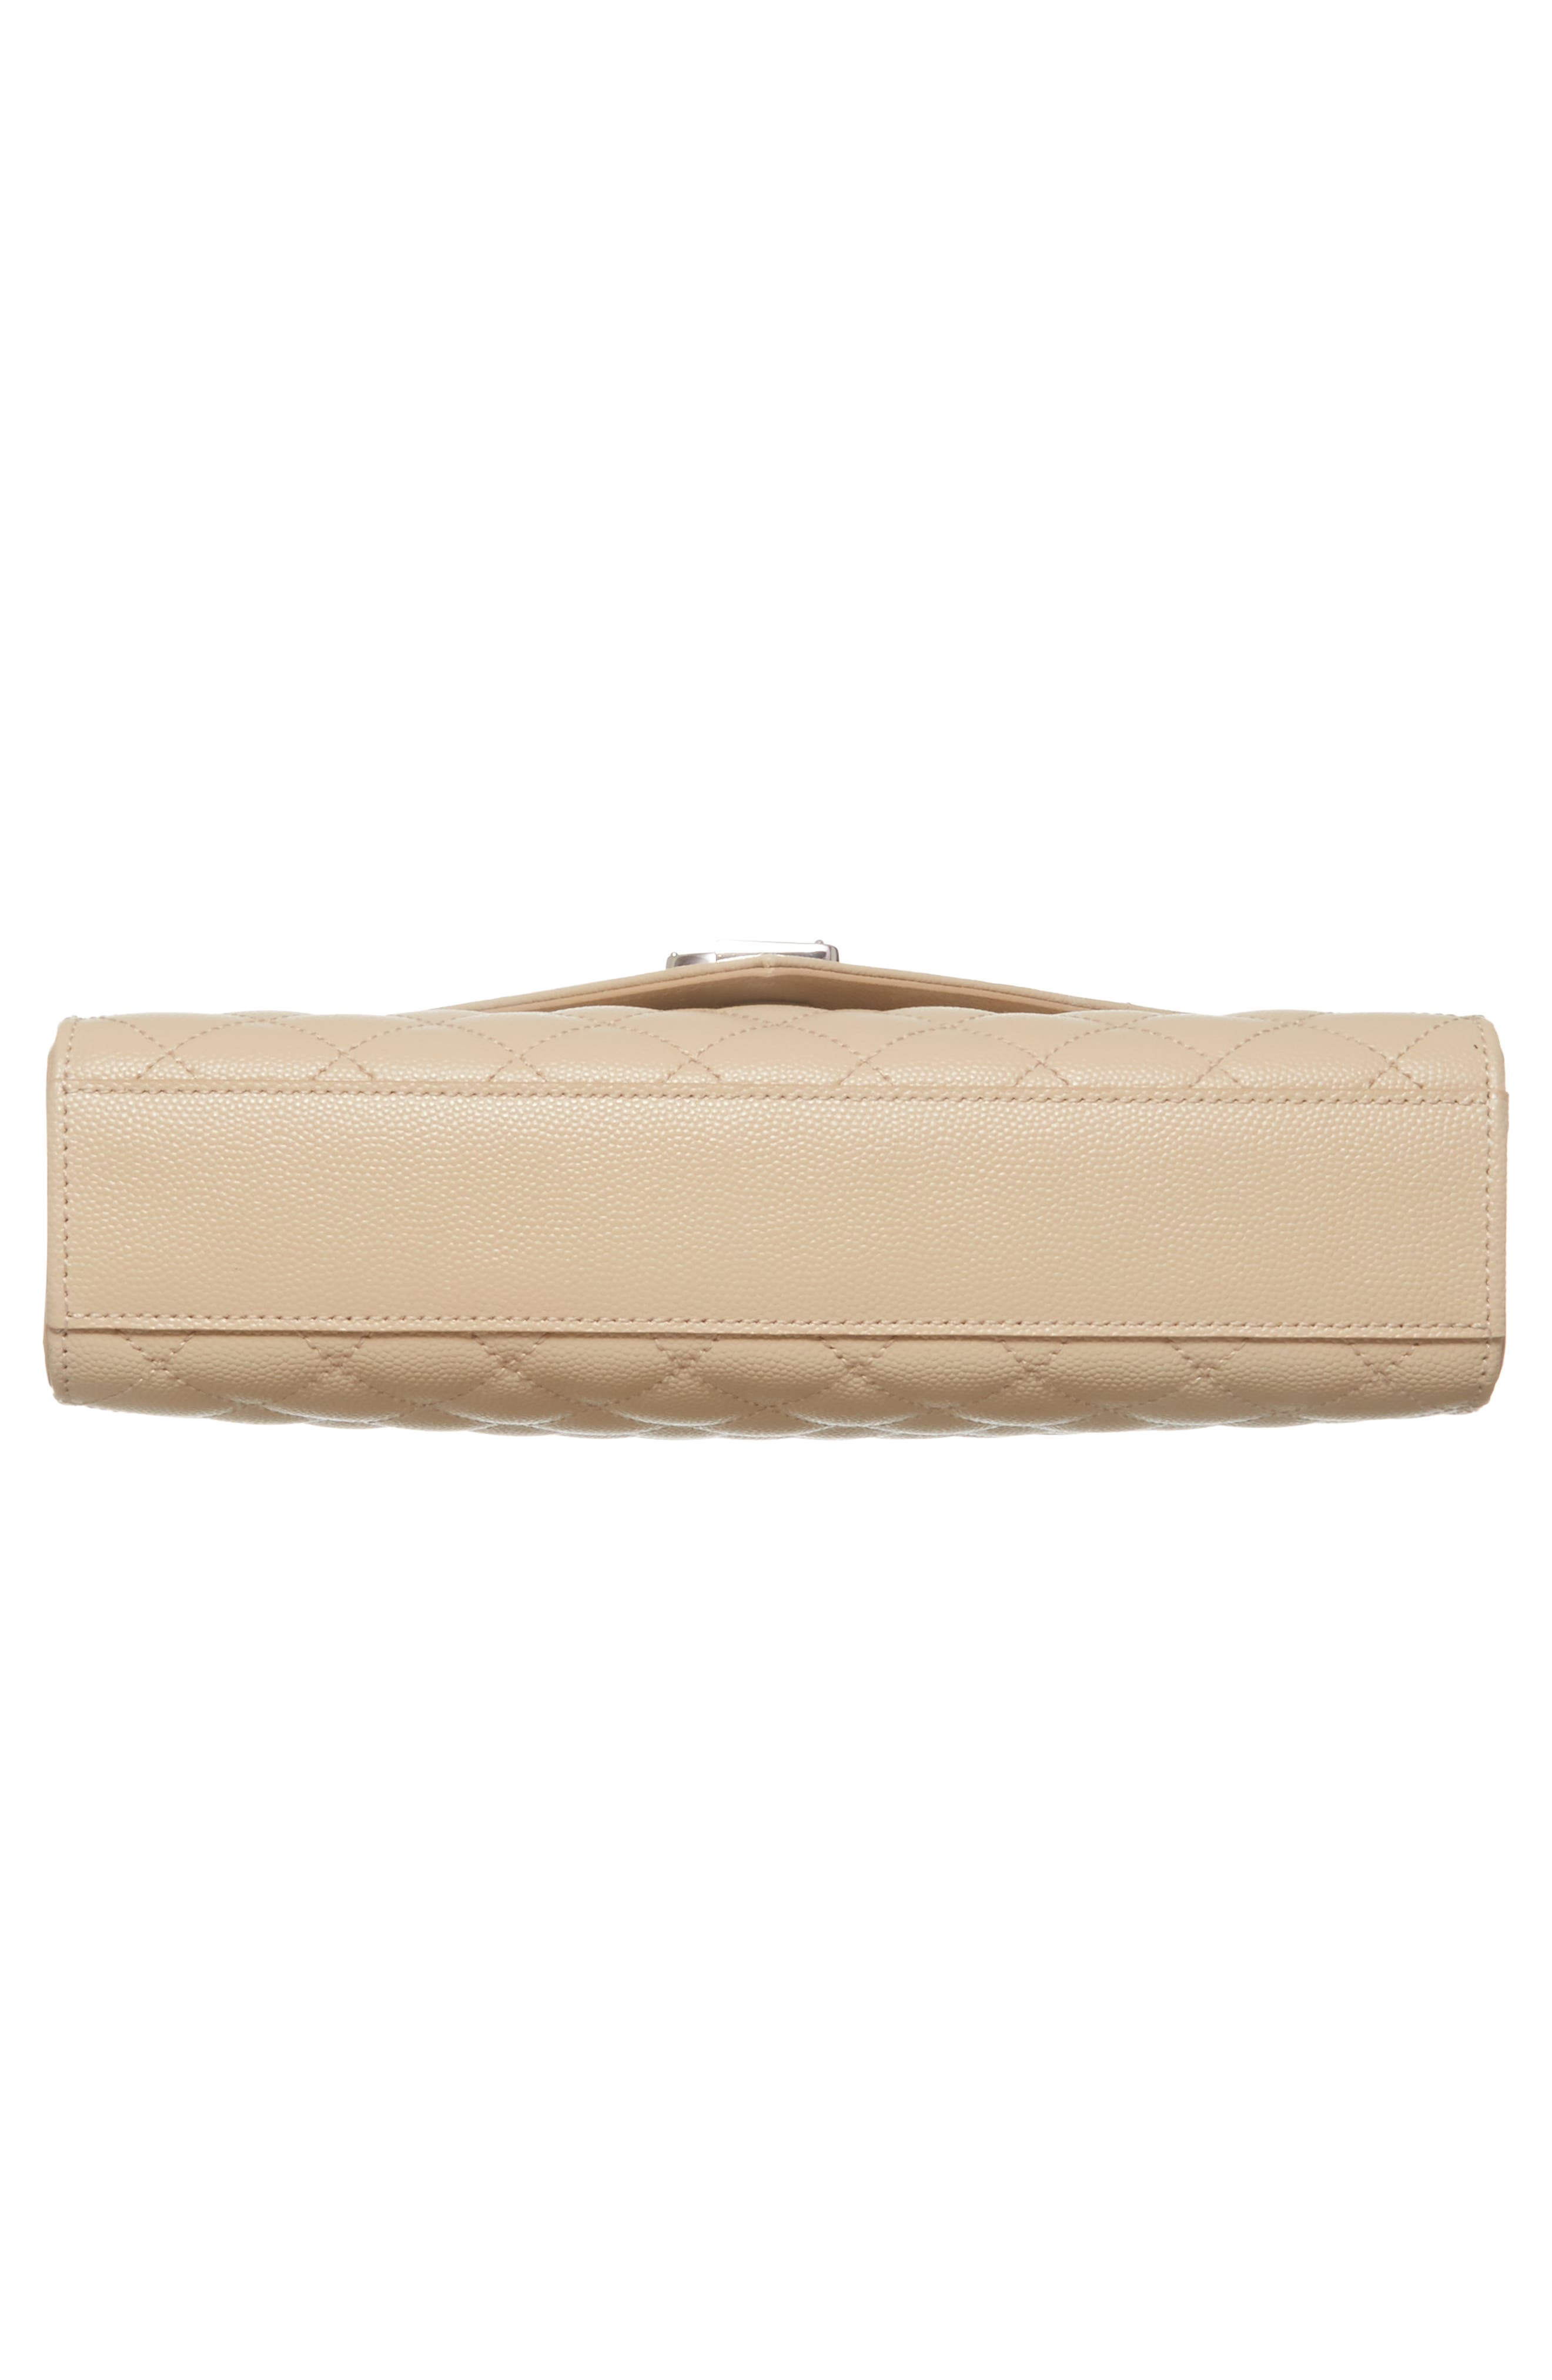 Medium Cassandra Calfskin Shoulder Bag,                             Alternate thumbnail 6, color,                             POUDRE